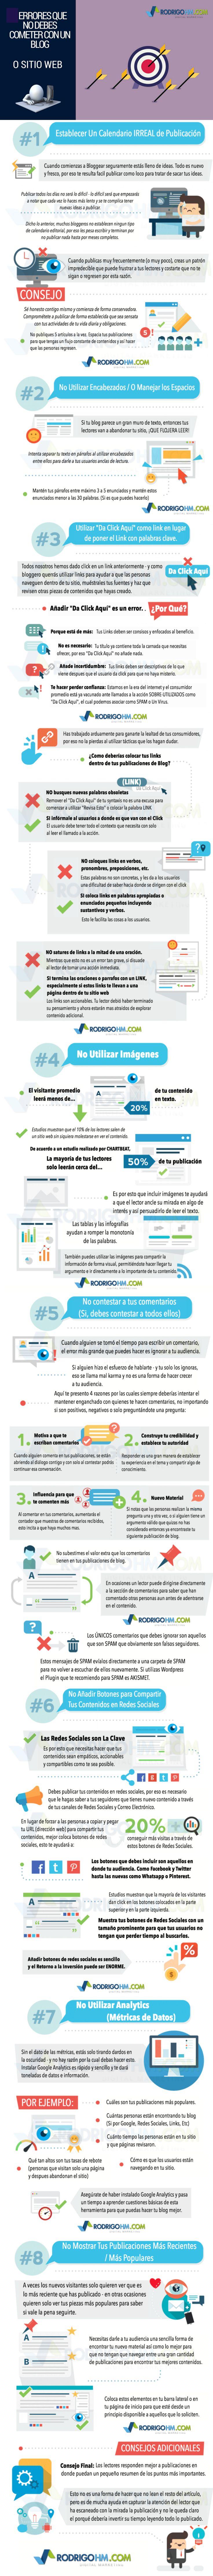 8 errores que no debes cometer con tu blog o web  Aquí encontrarás #infografias de temática relacionada con #blogs, herramientas para #bloggers, etc.